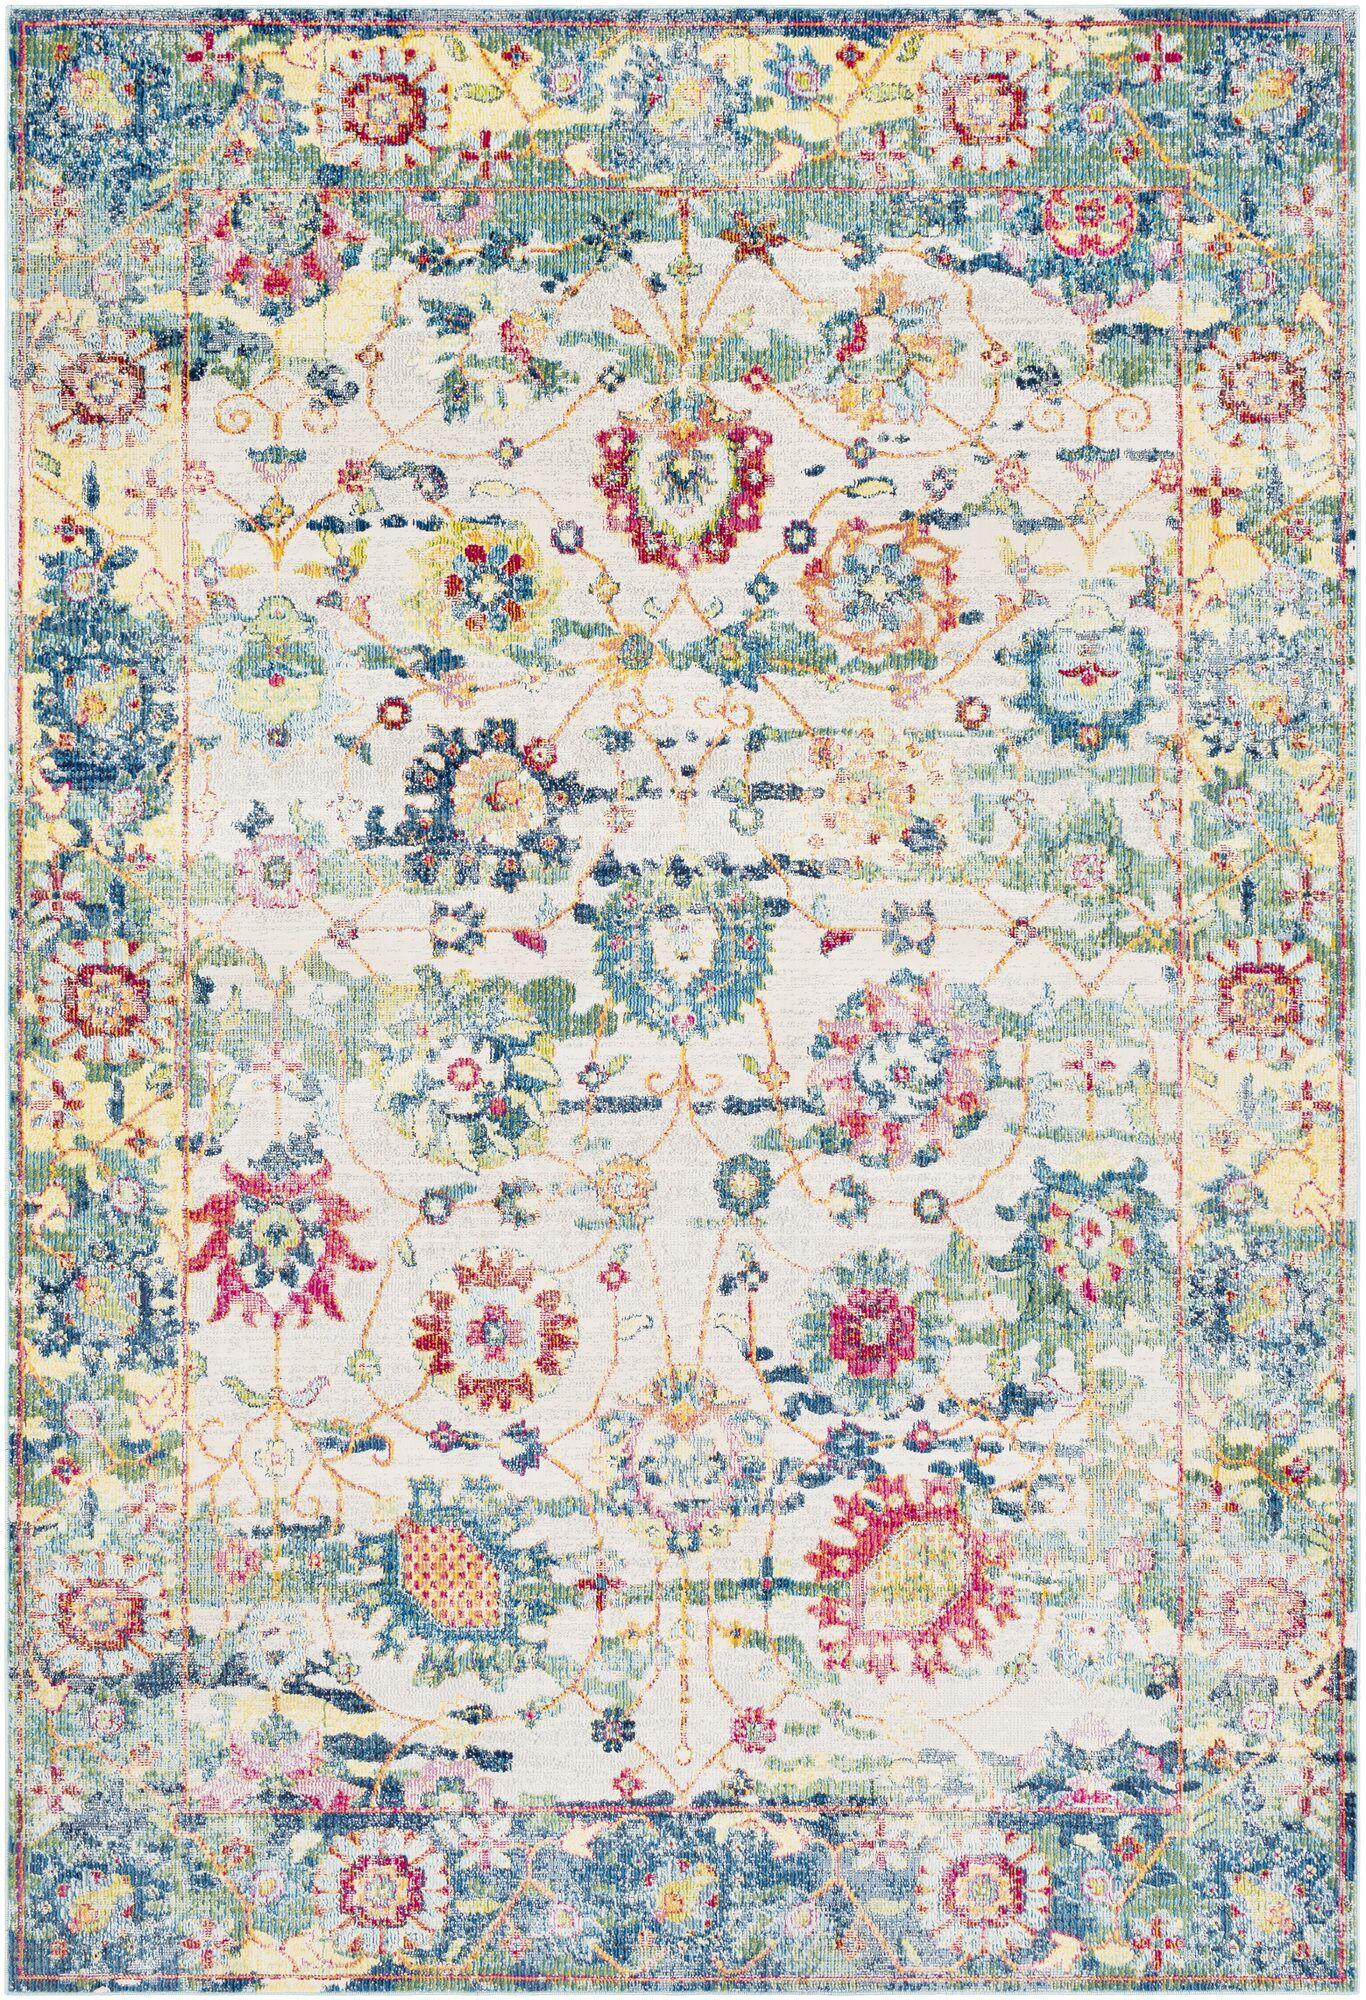 Tillamook Silk Vintage Floral Sky Blue/Bright Blue Area Rug Rug Size: Rectangle 5'3